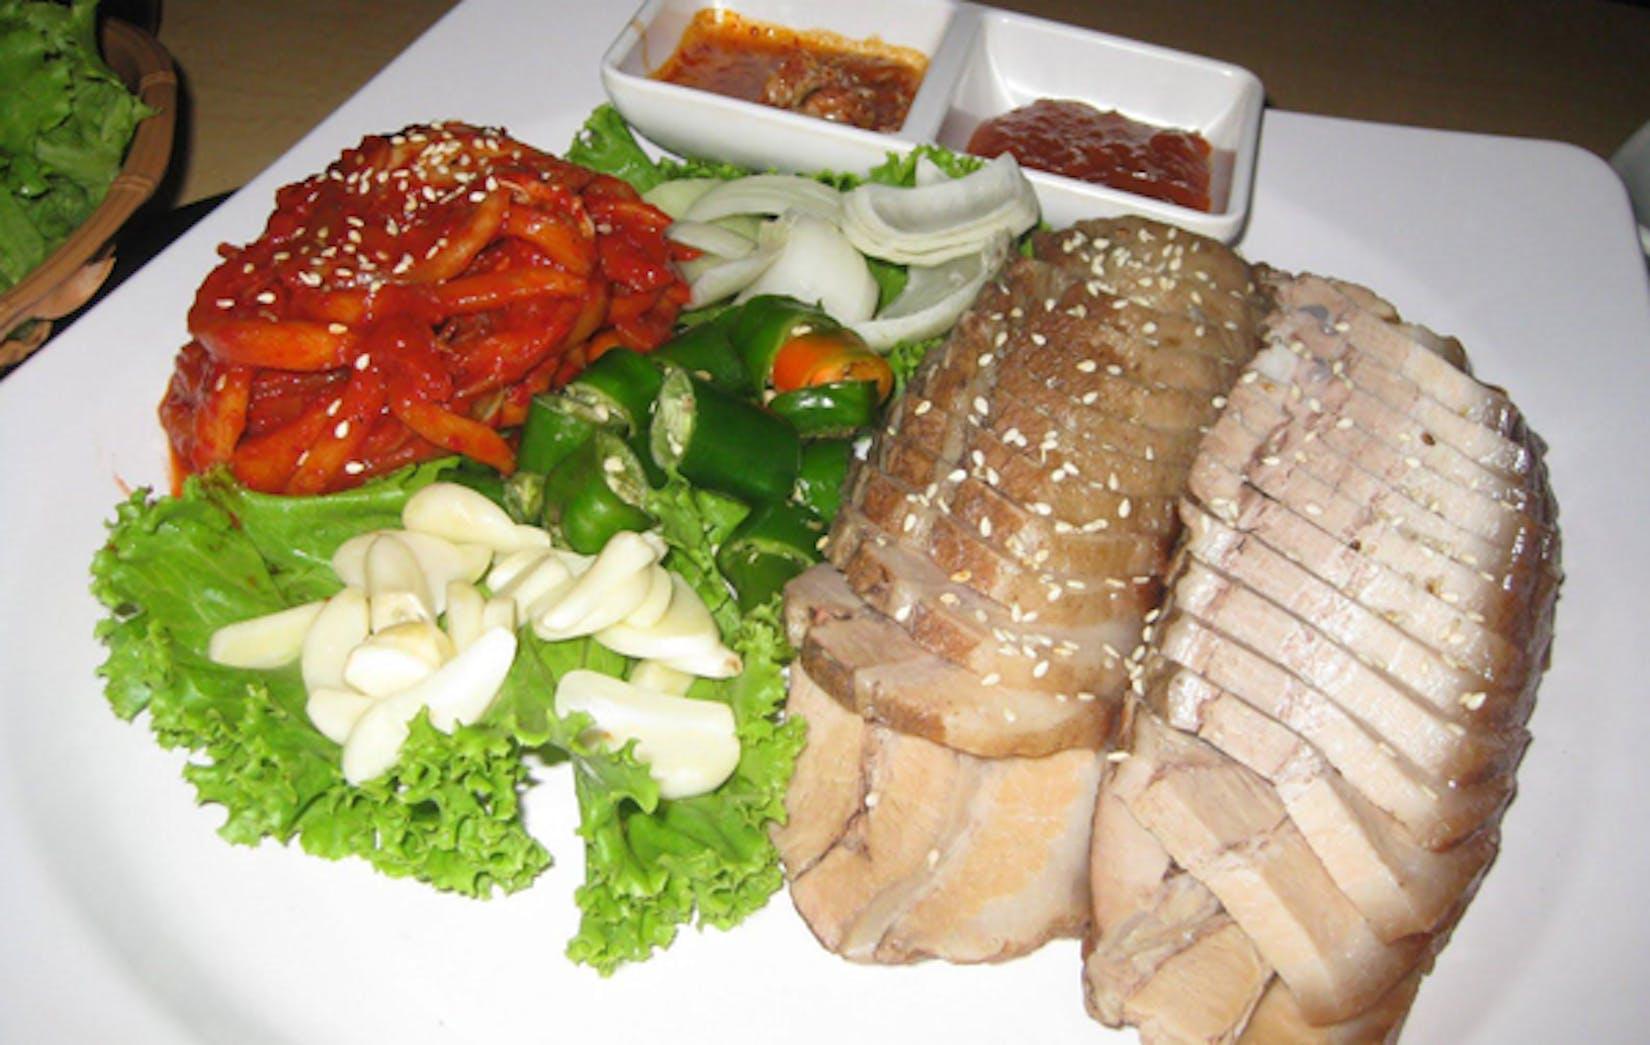 Pwint Myanmar Traditional Food | yathar